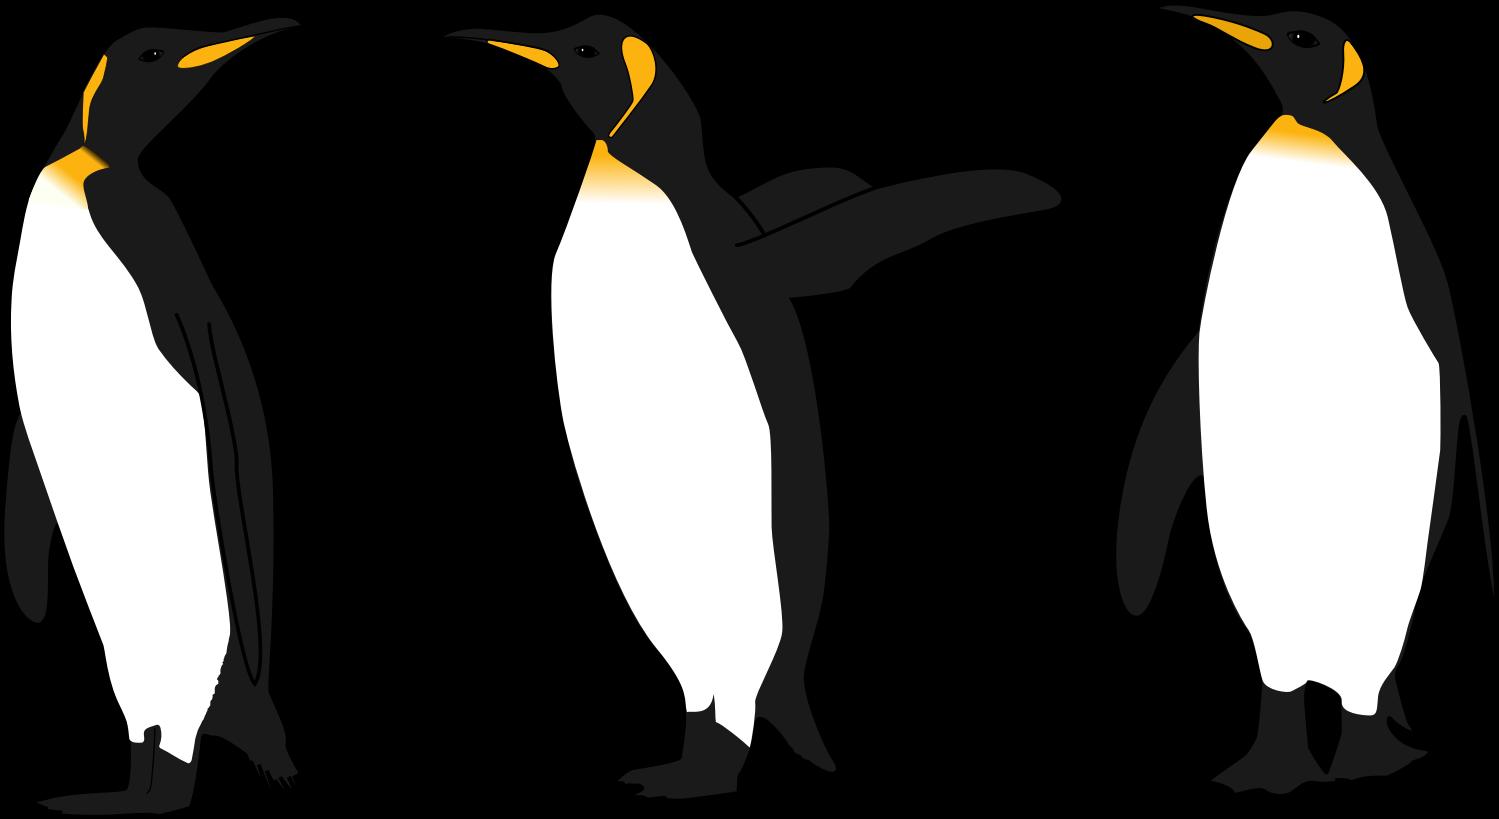 King Penguin clipart Clipart Penguin photo#2 King Clipart